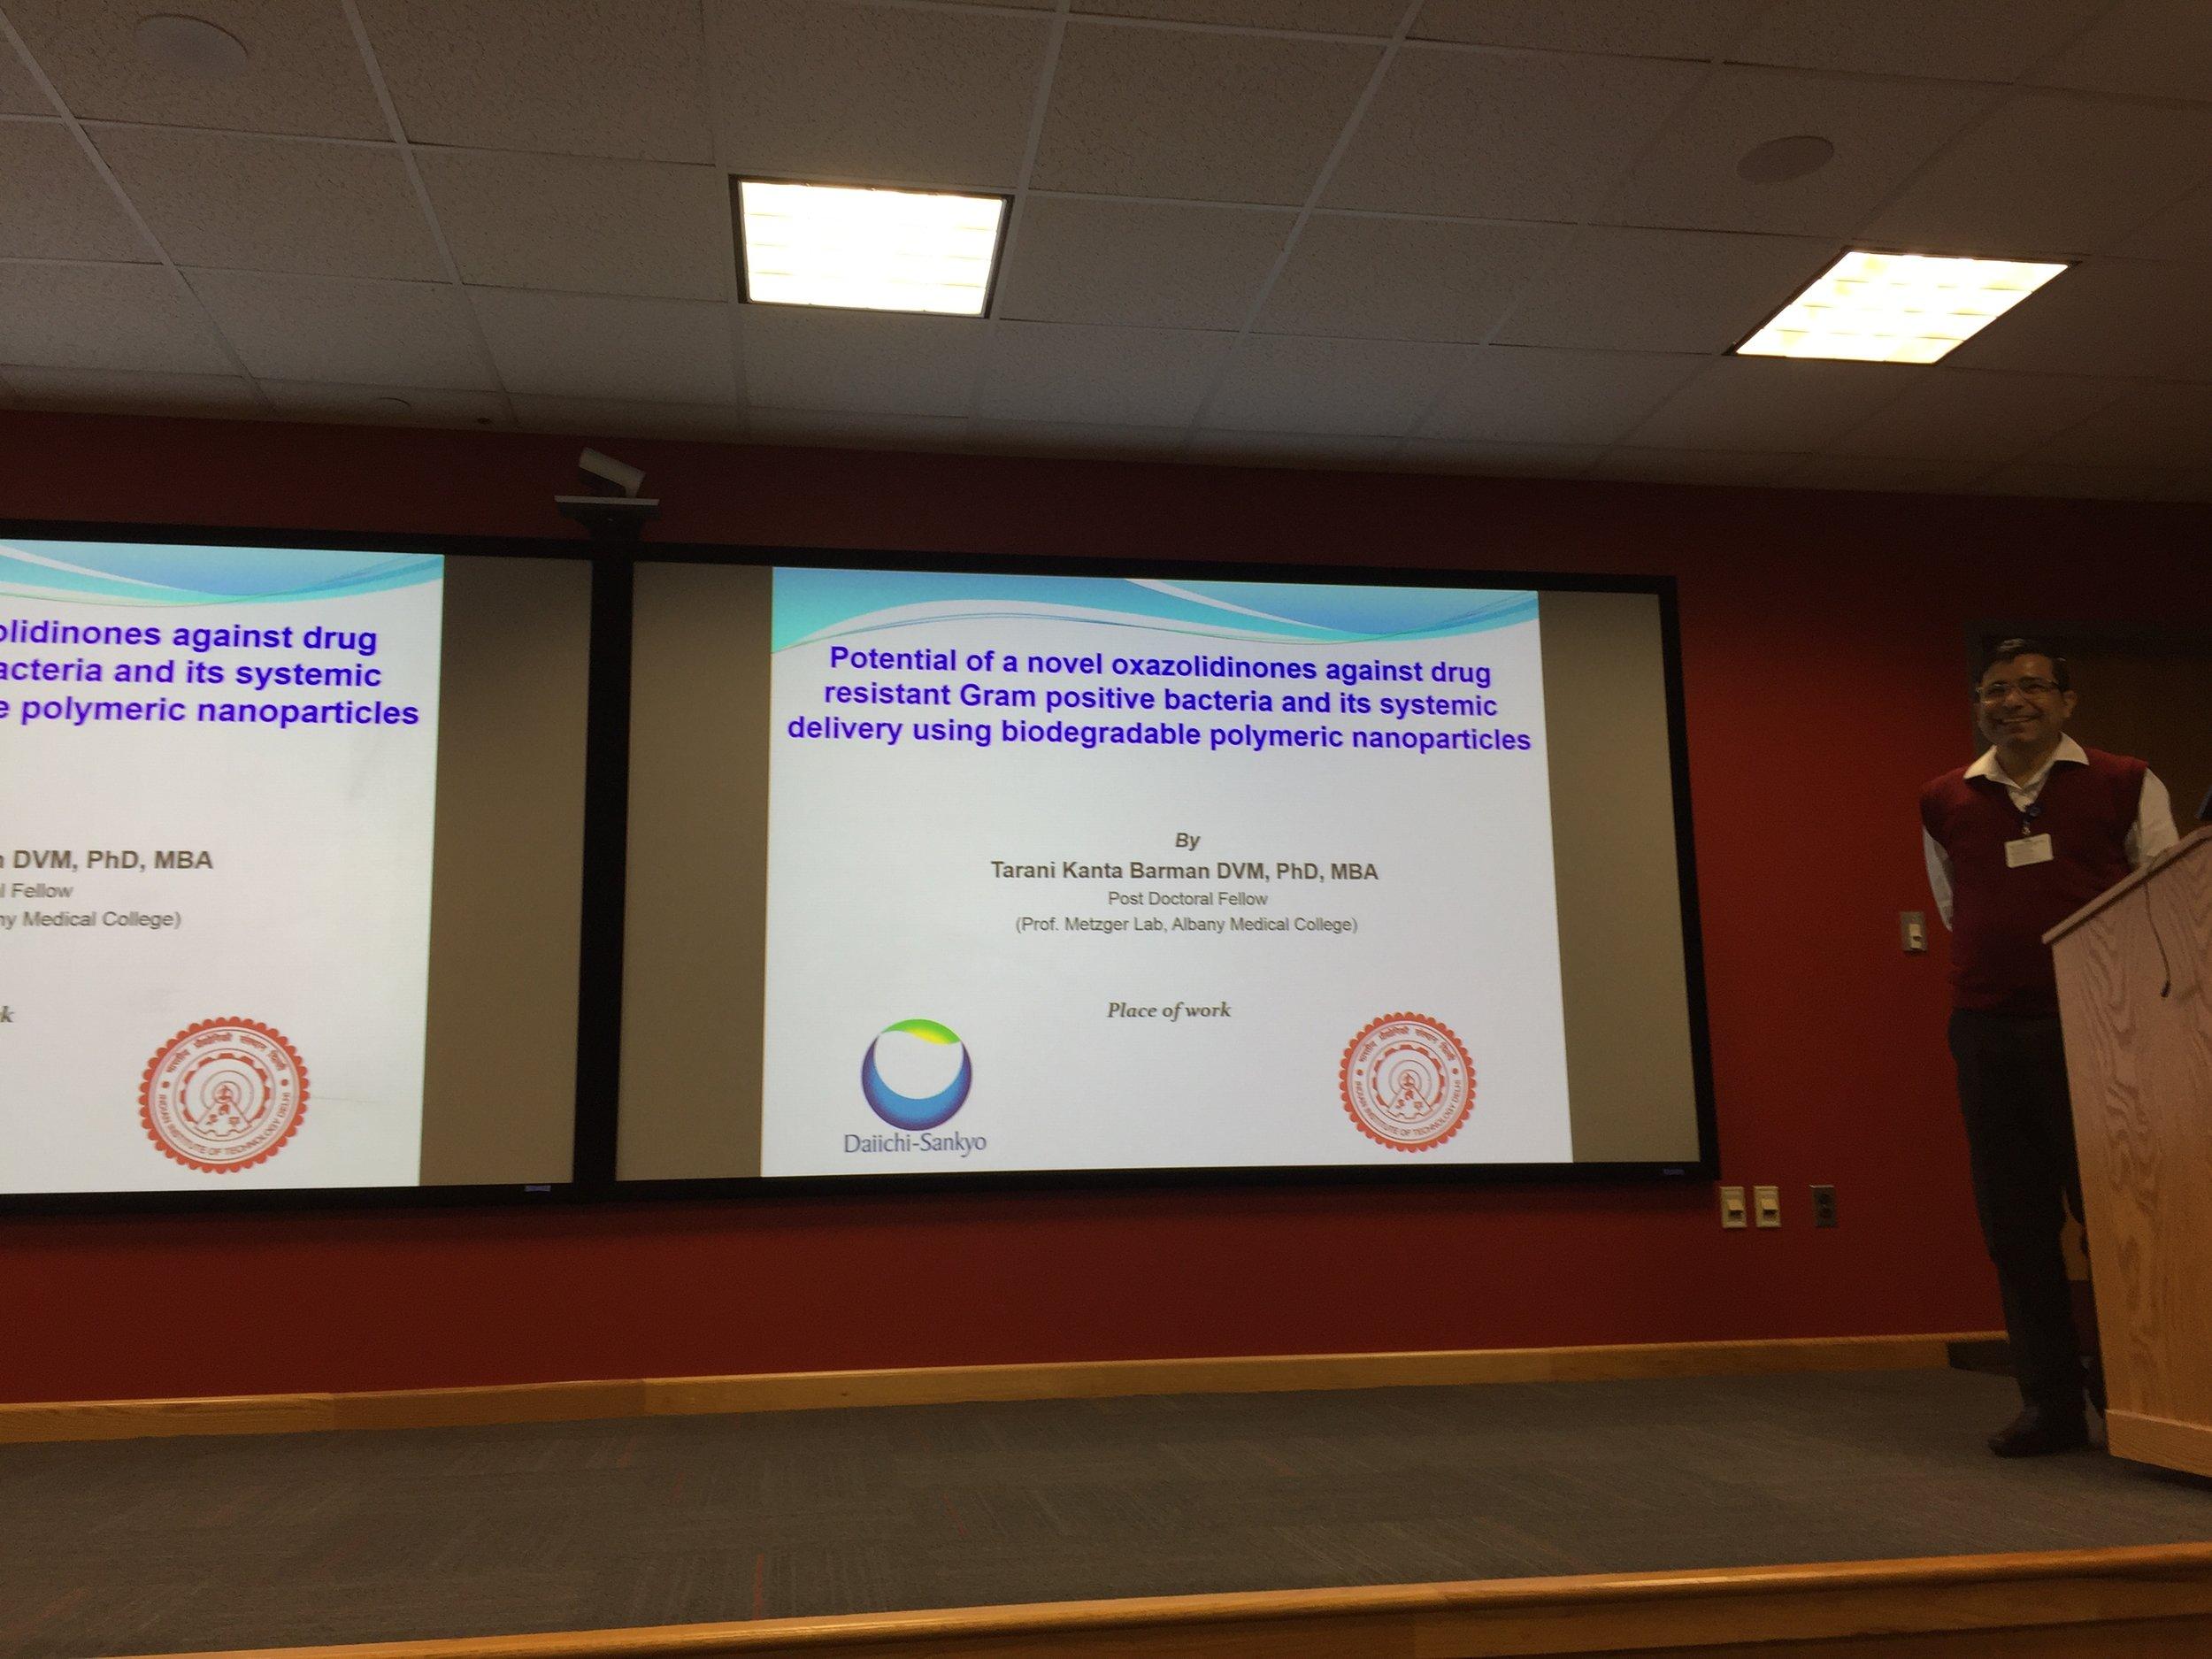 Tarani Kanta Barman, PhD shared the work he did in his PhD characterizing a novel antibiotic.